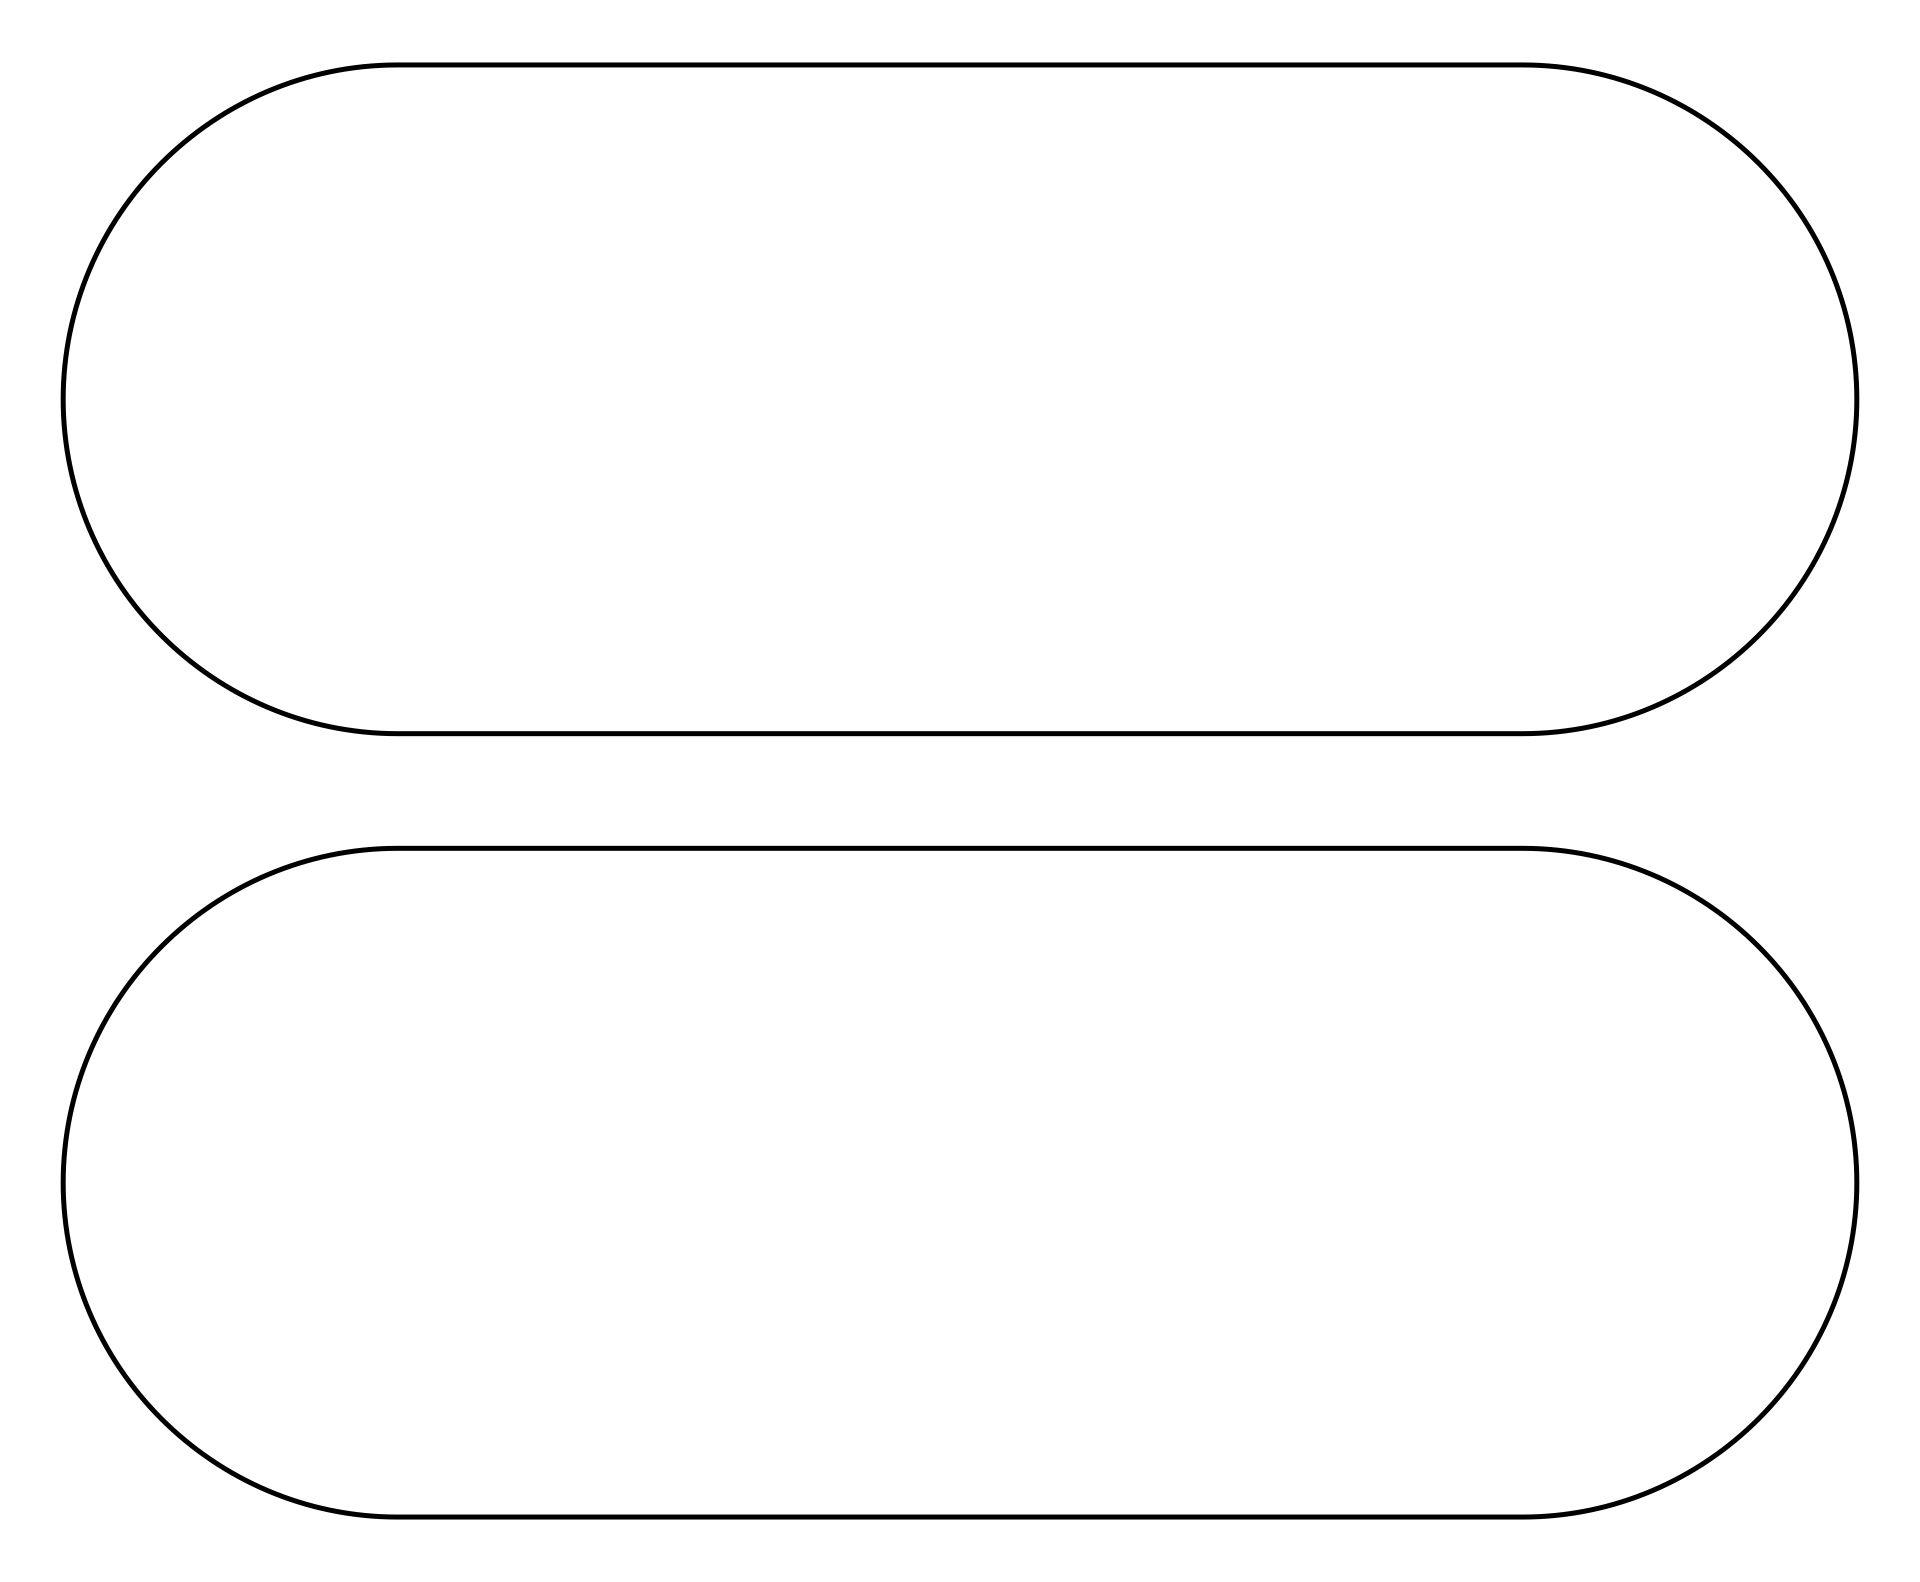 Printable Oval Tail Light Template